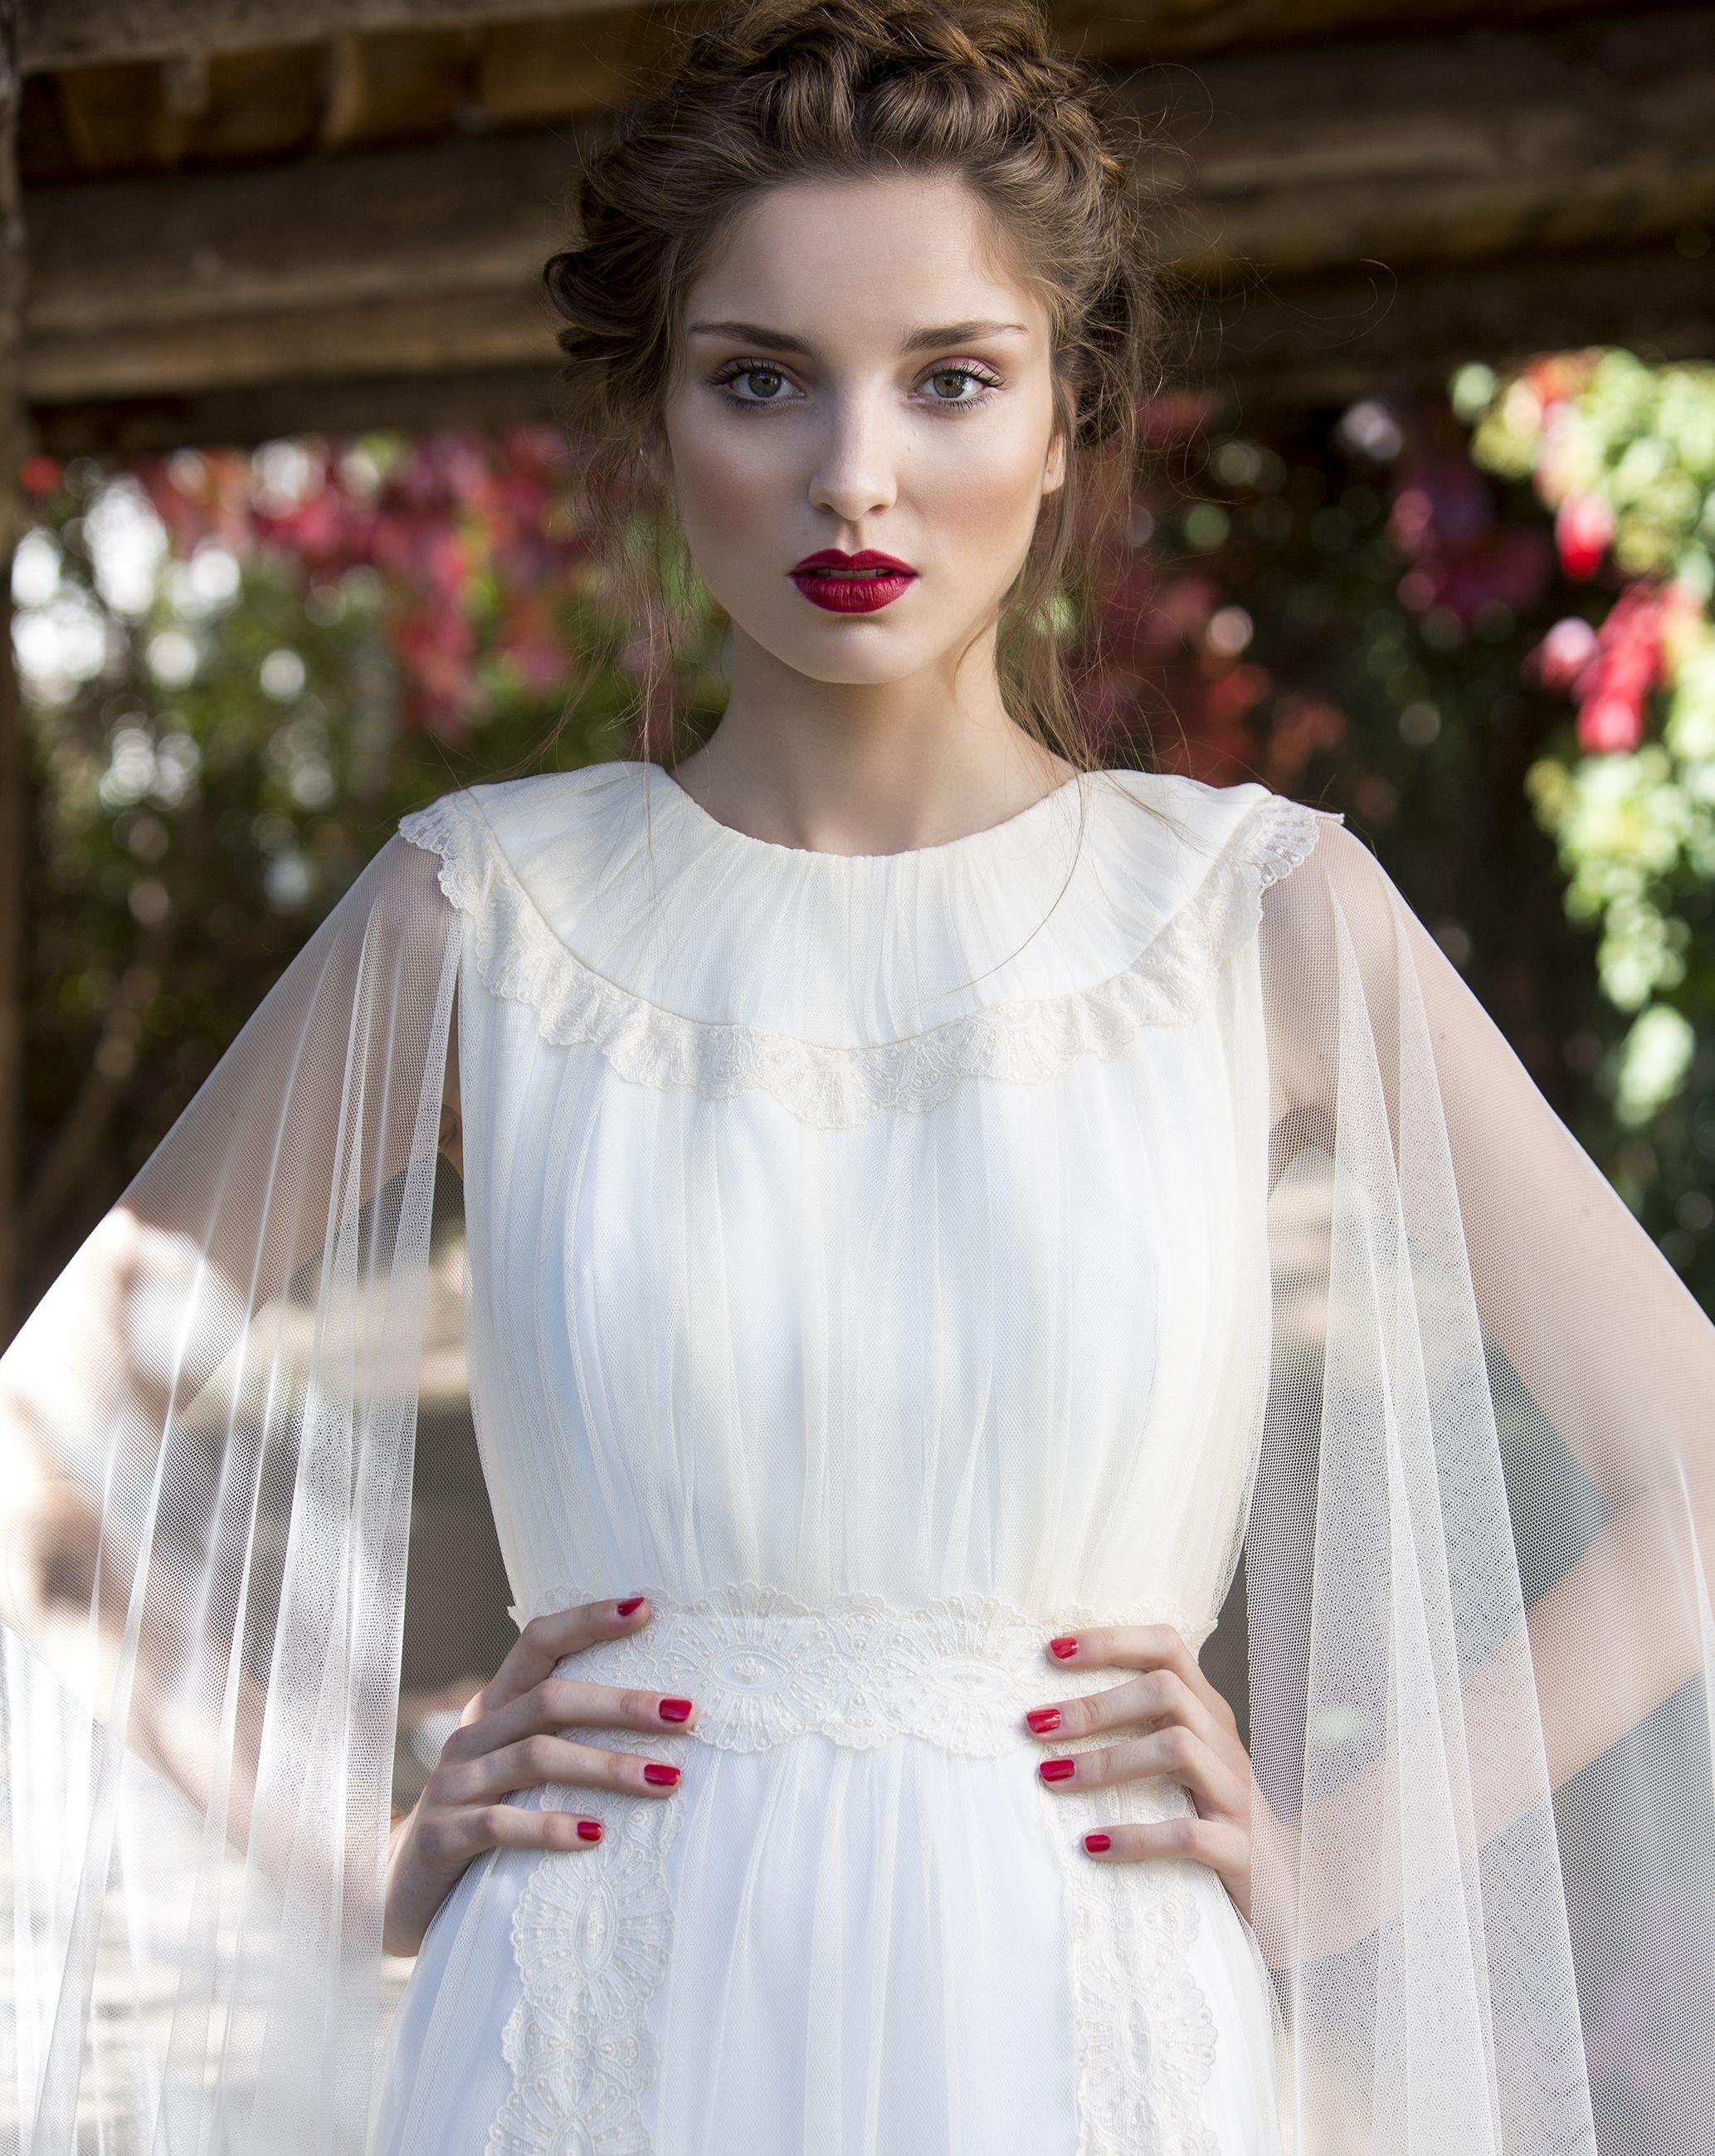 Bridal #BridalDresses #DavidChristian #Wedding #WedddingDresses ...